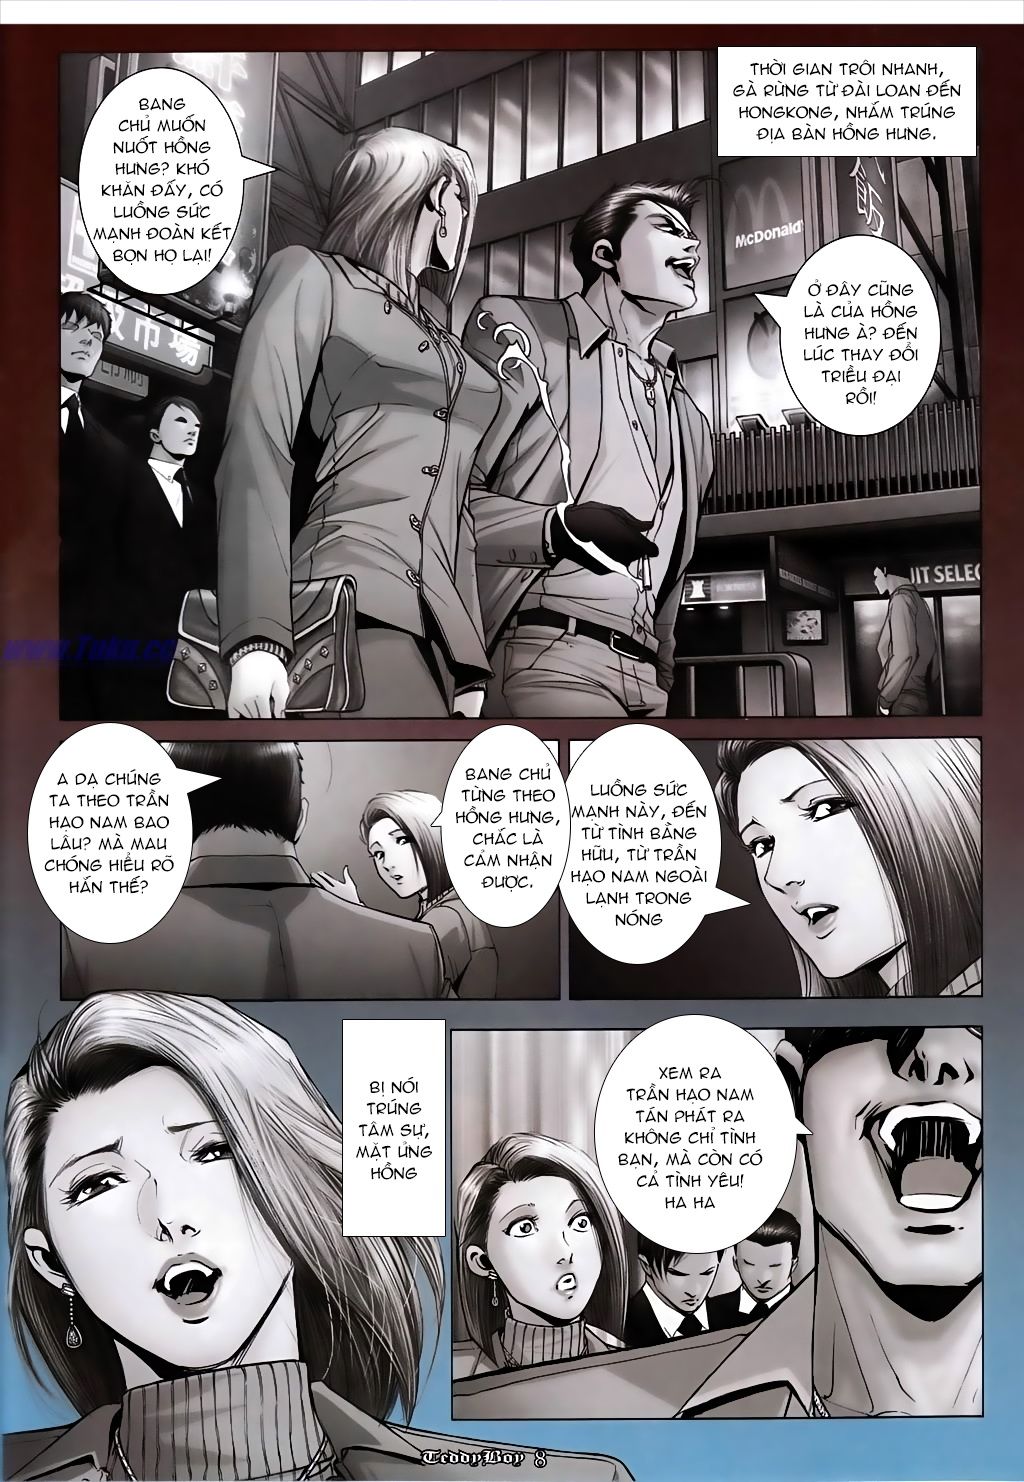 Người Trong Giang Hồ Chap 1023 - Truyen.Chap.VN